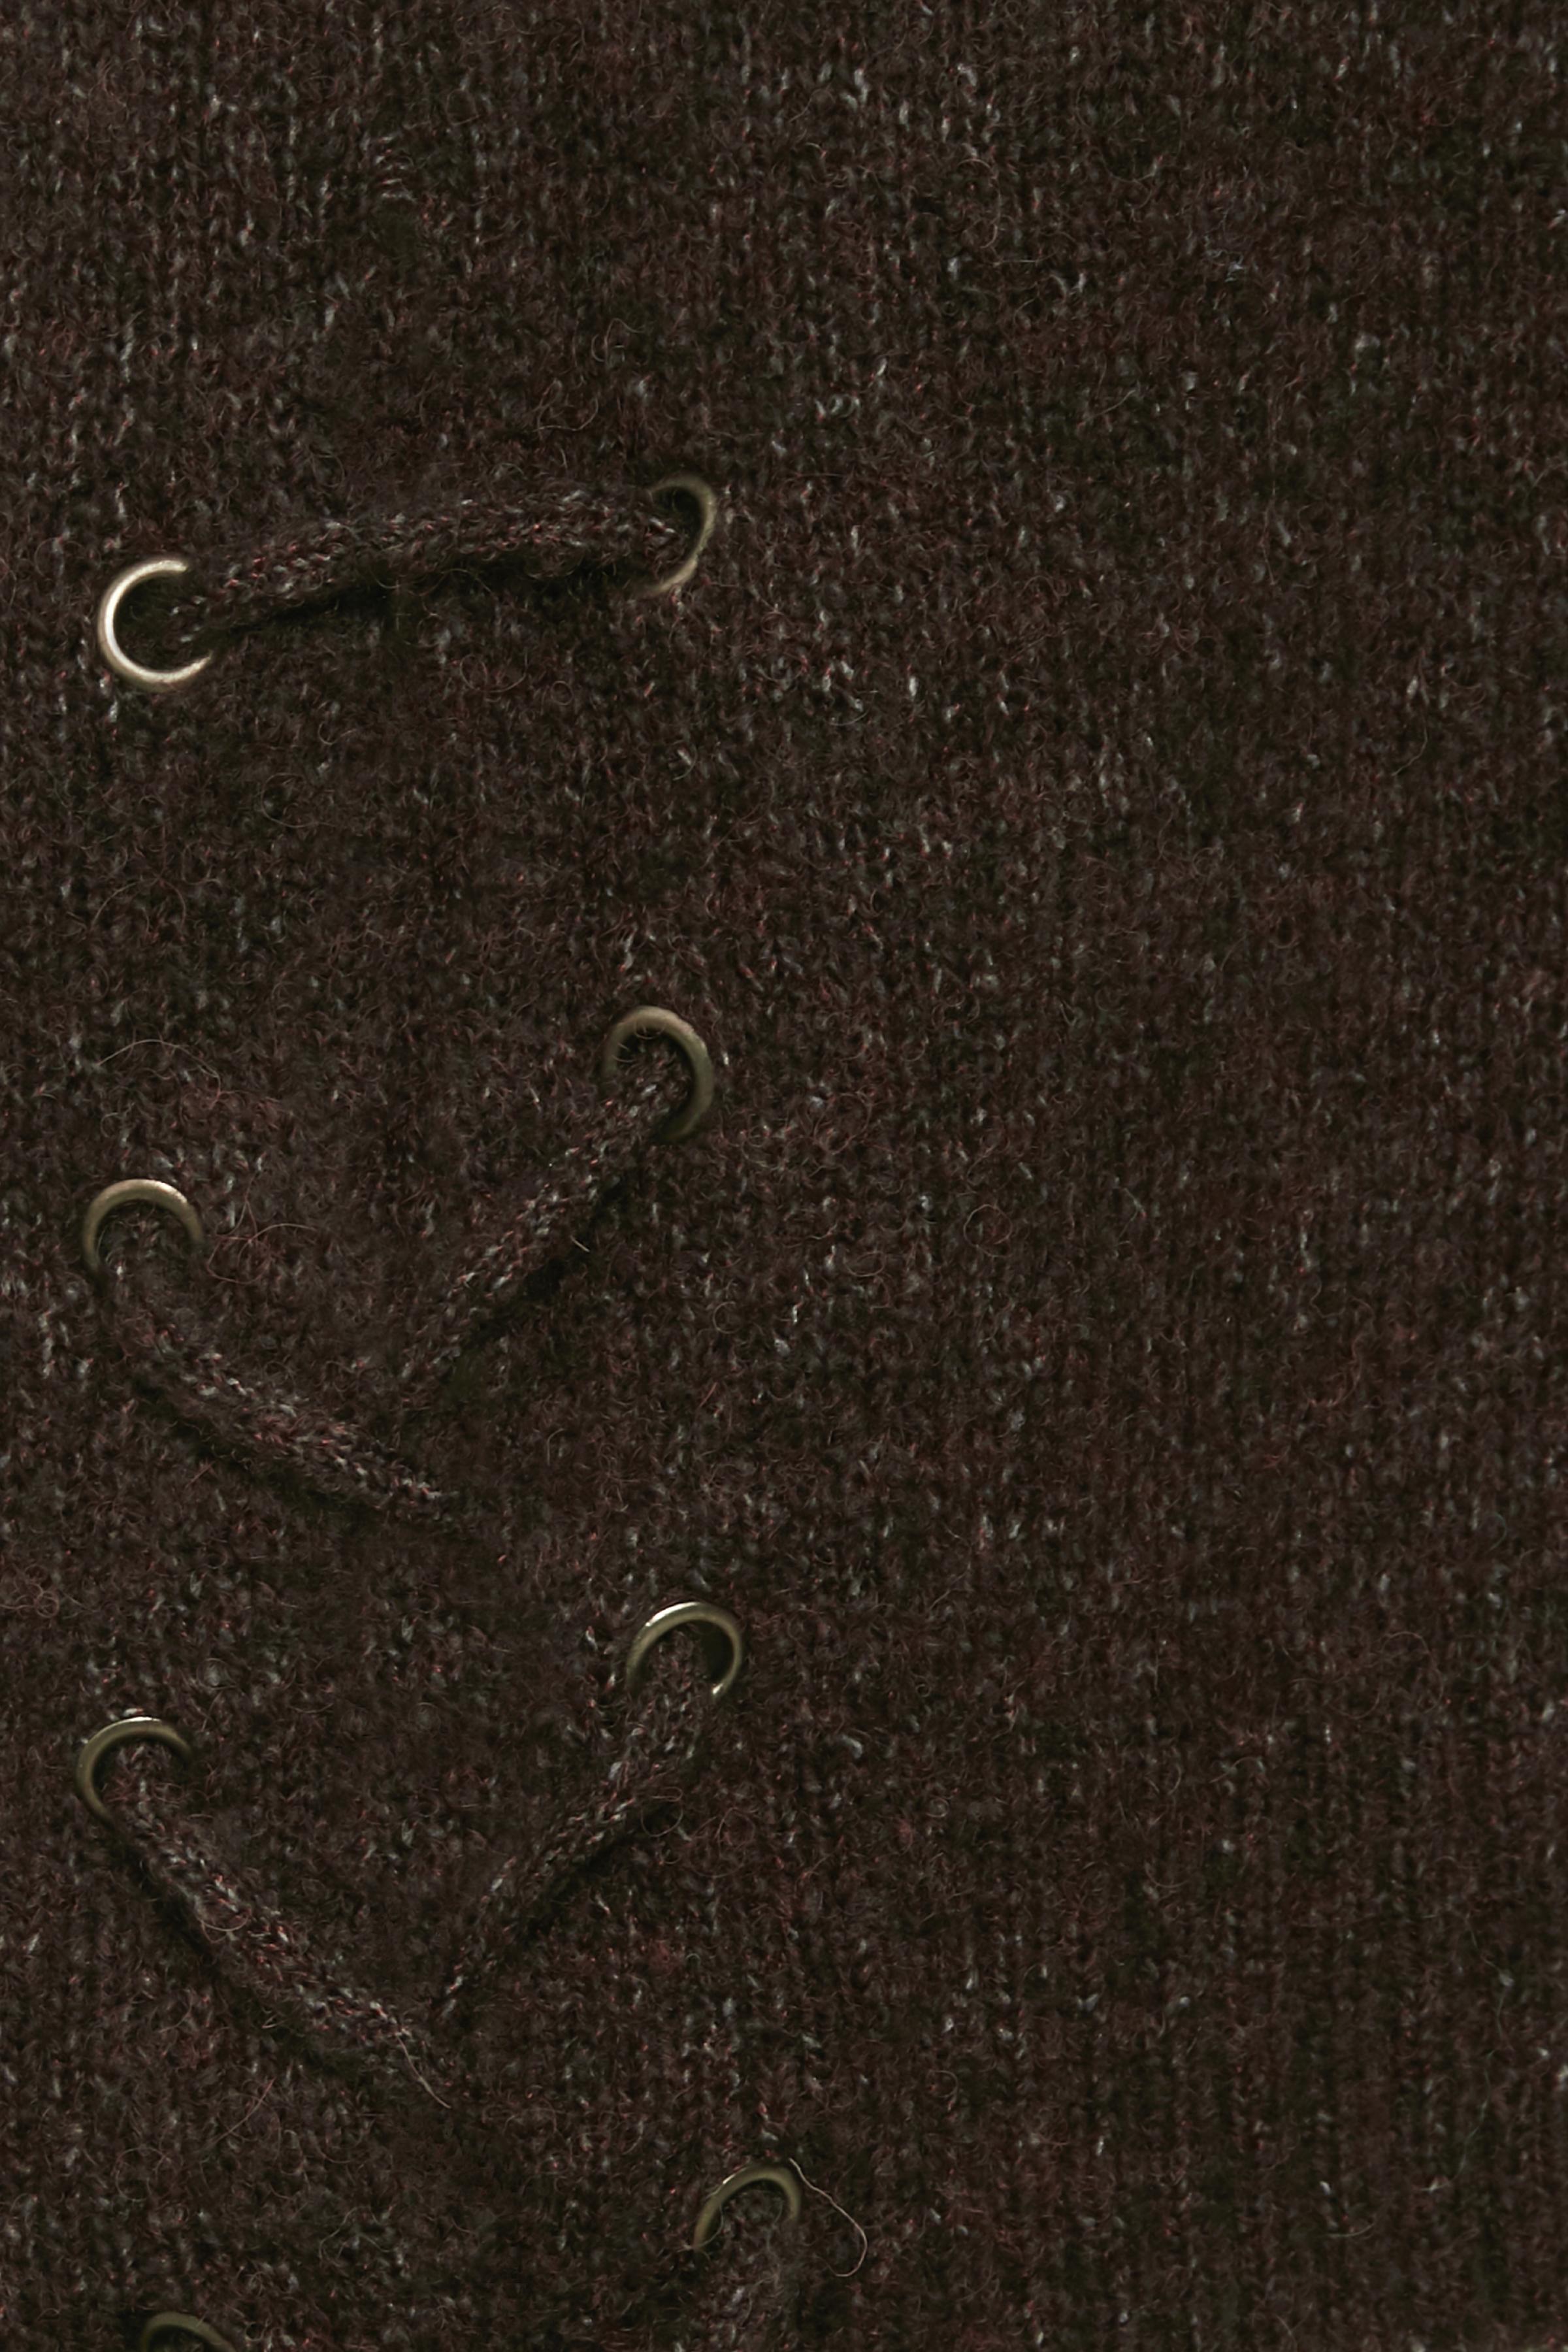 Mörkbrun Stickad tröja från Bon'A Parte – Köp Mörkbrun Stickad tröja från stl. S-2XL här